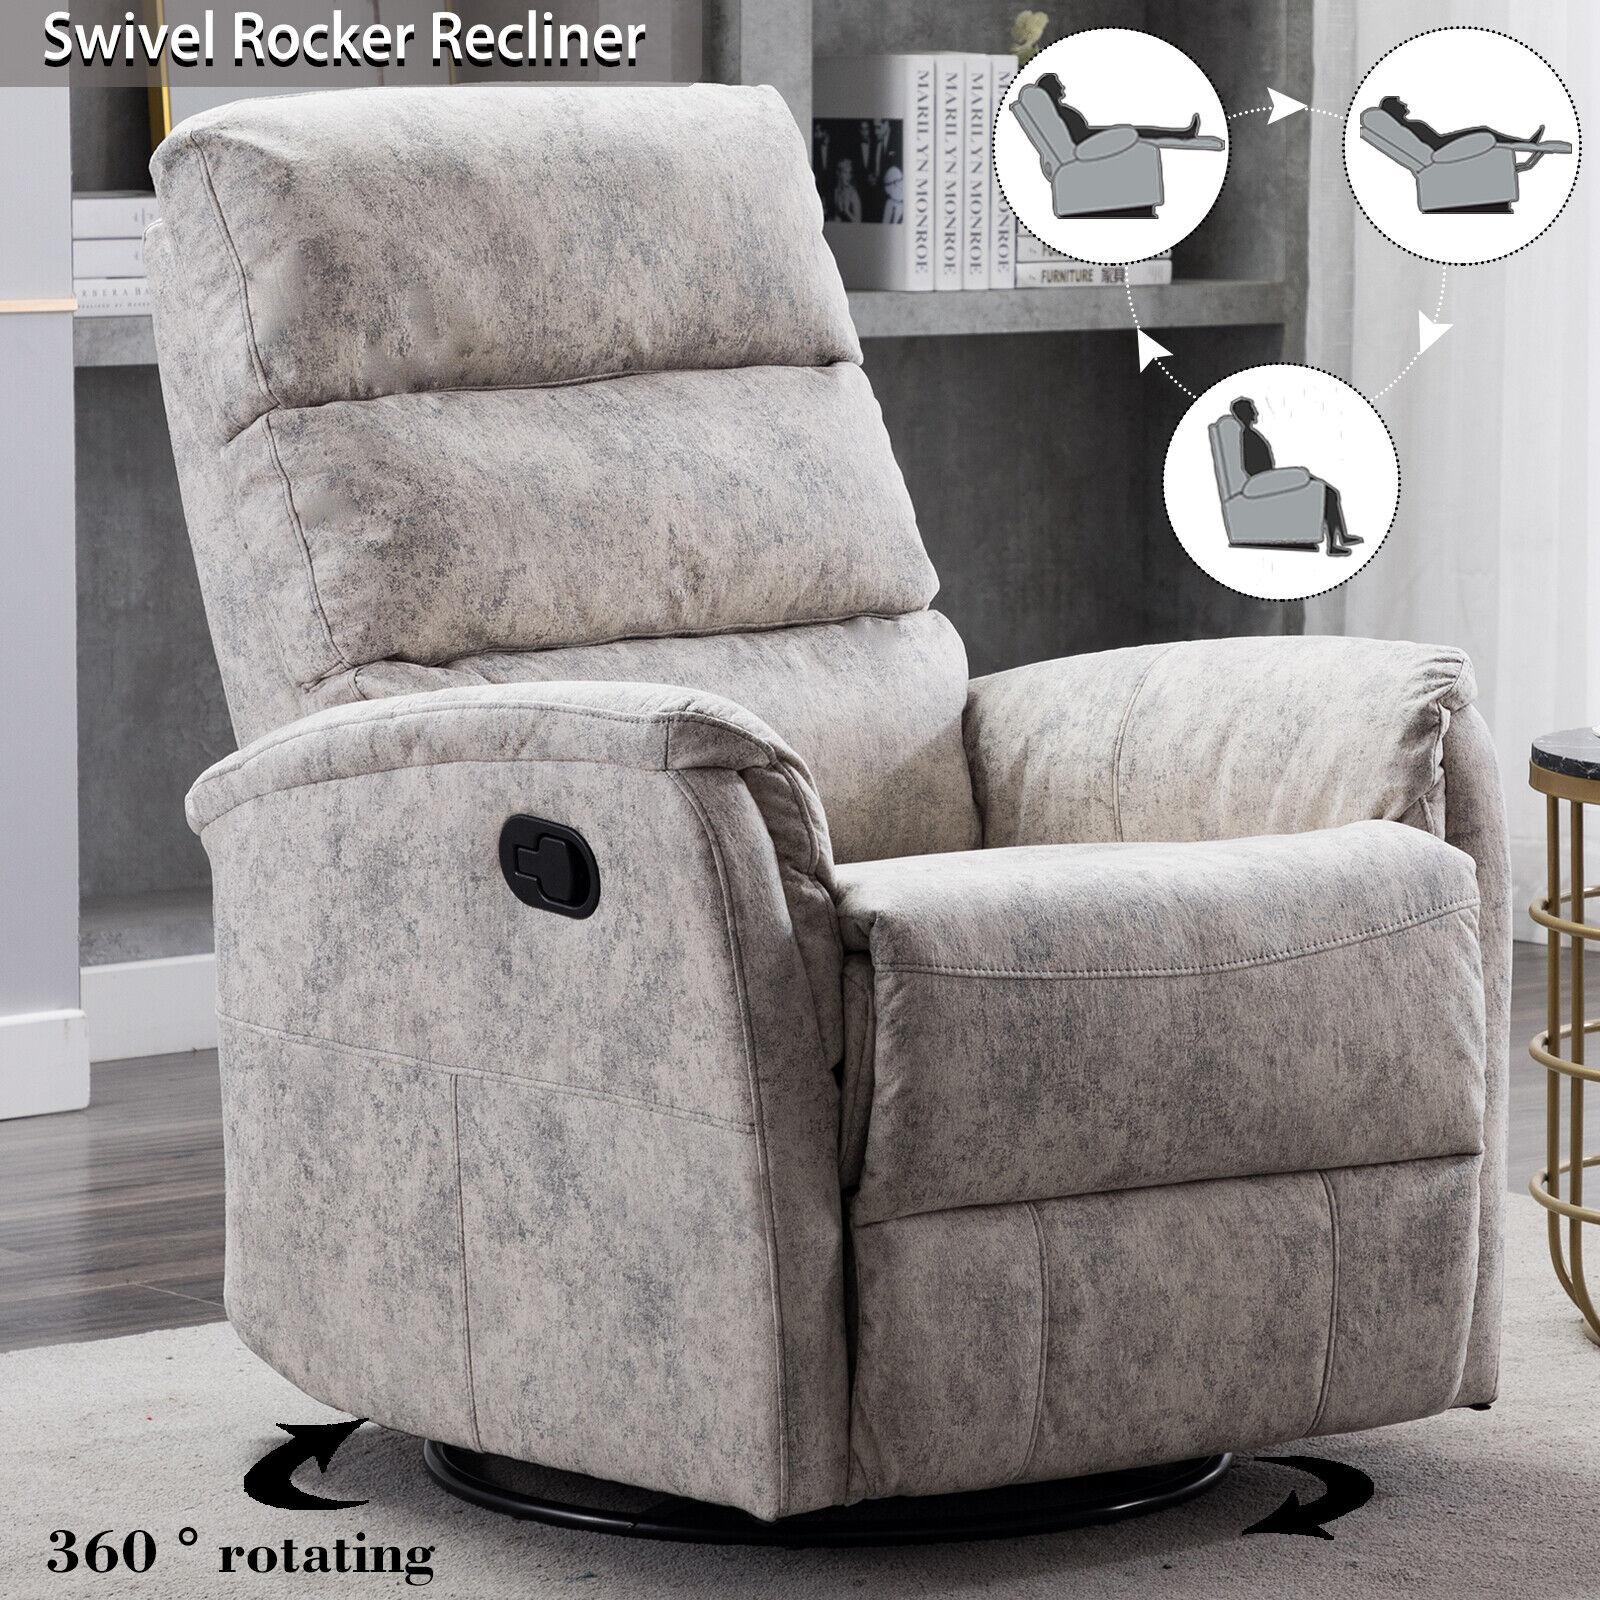 Swivel Rocking Recliner Chair Bruin Blog